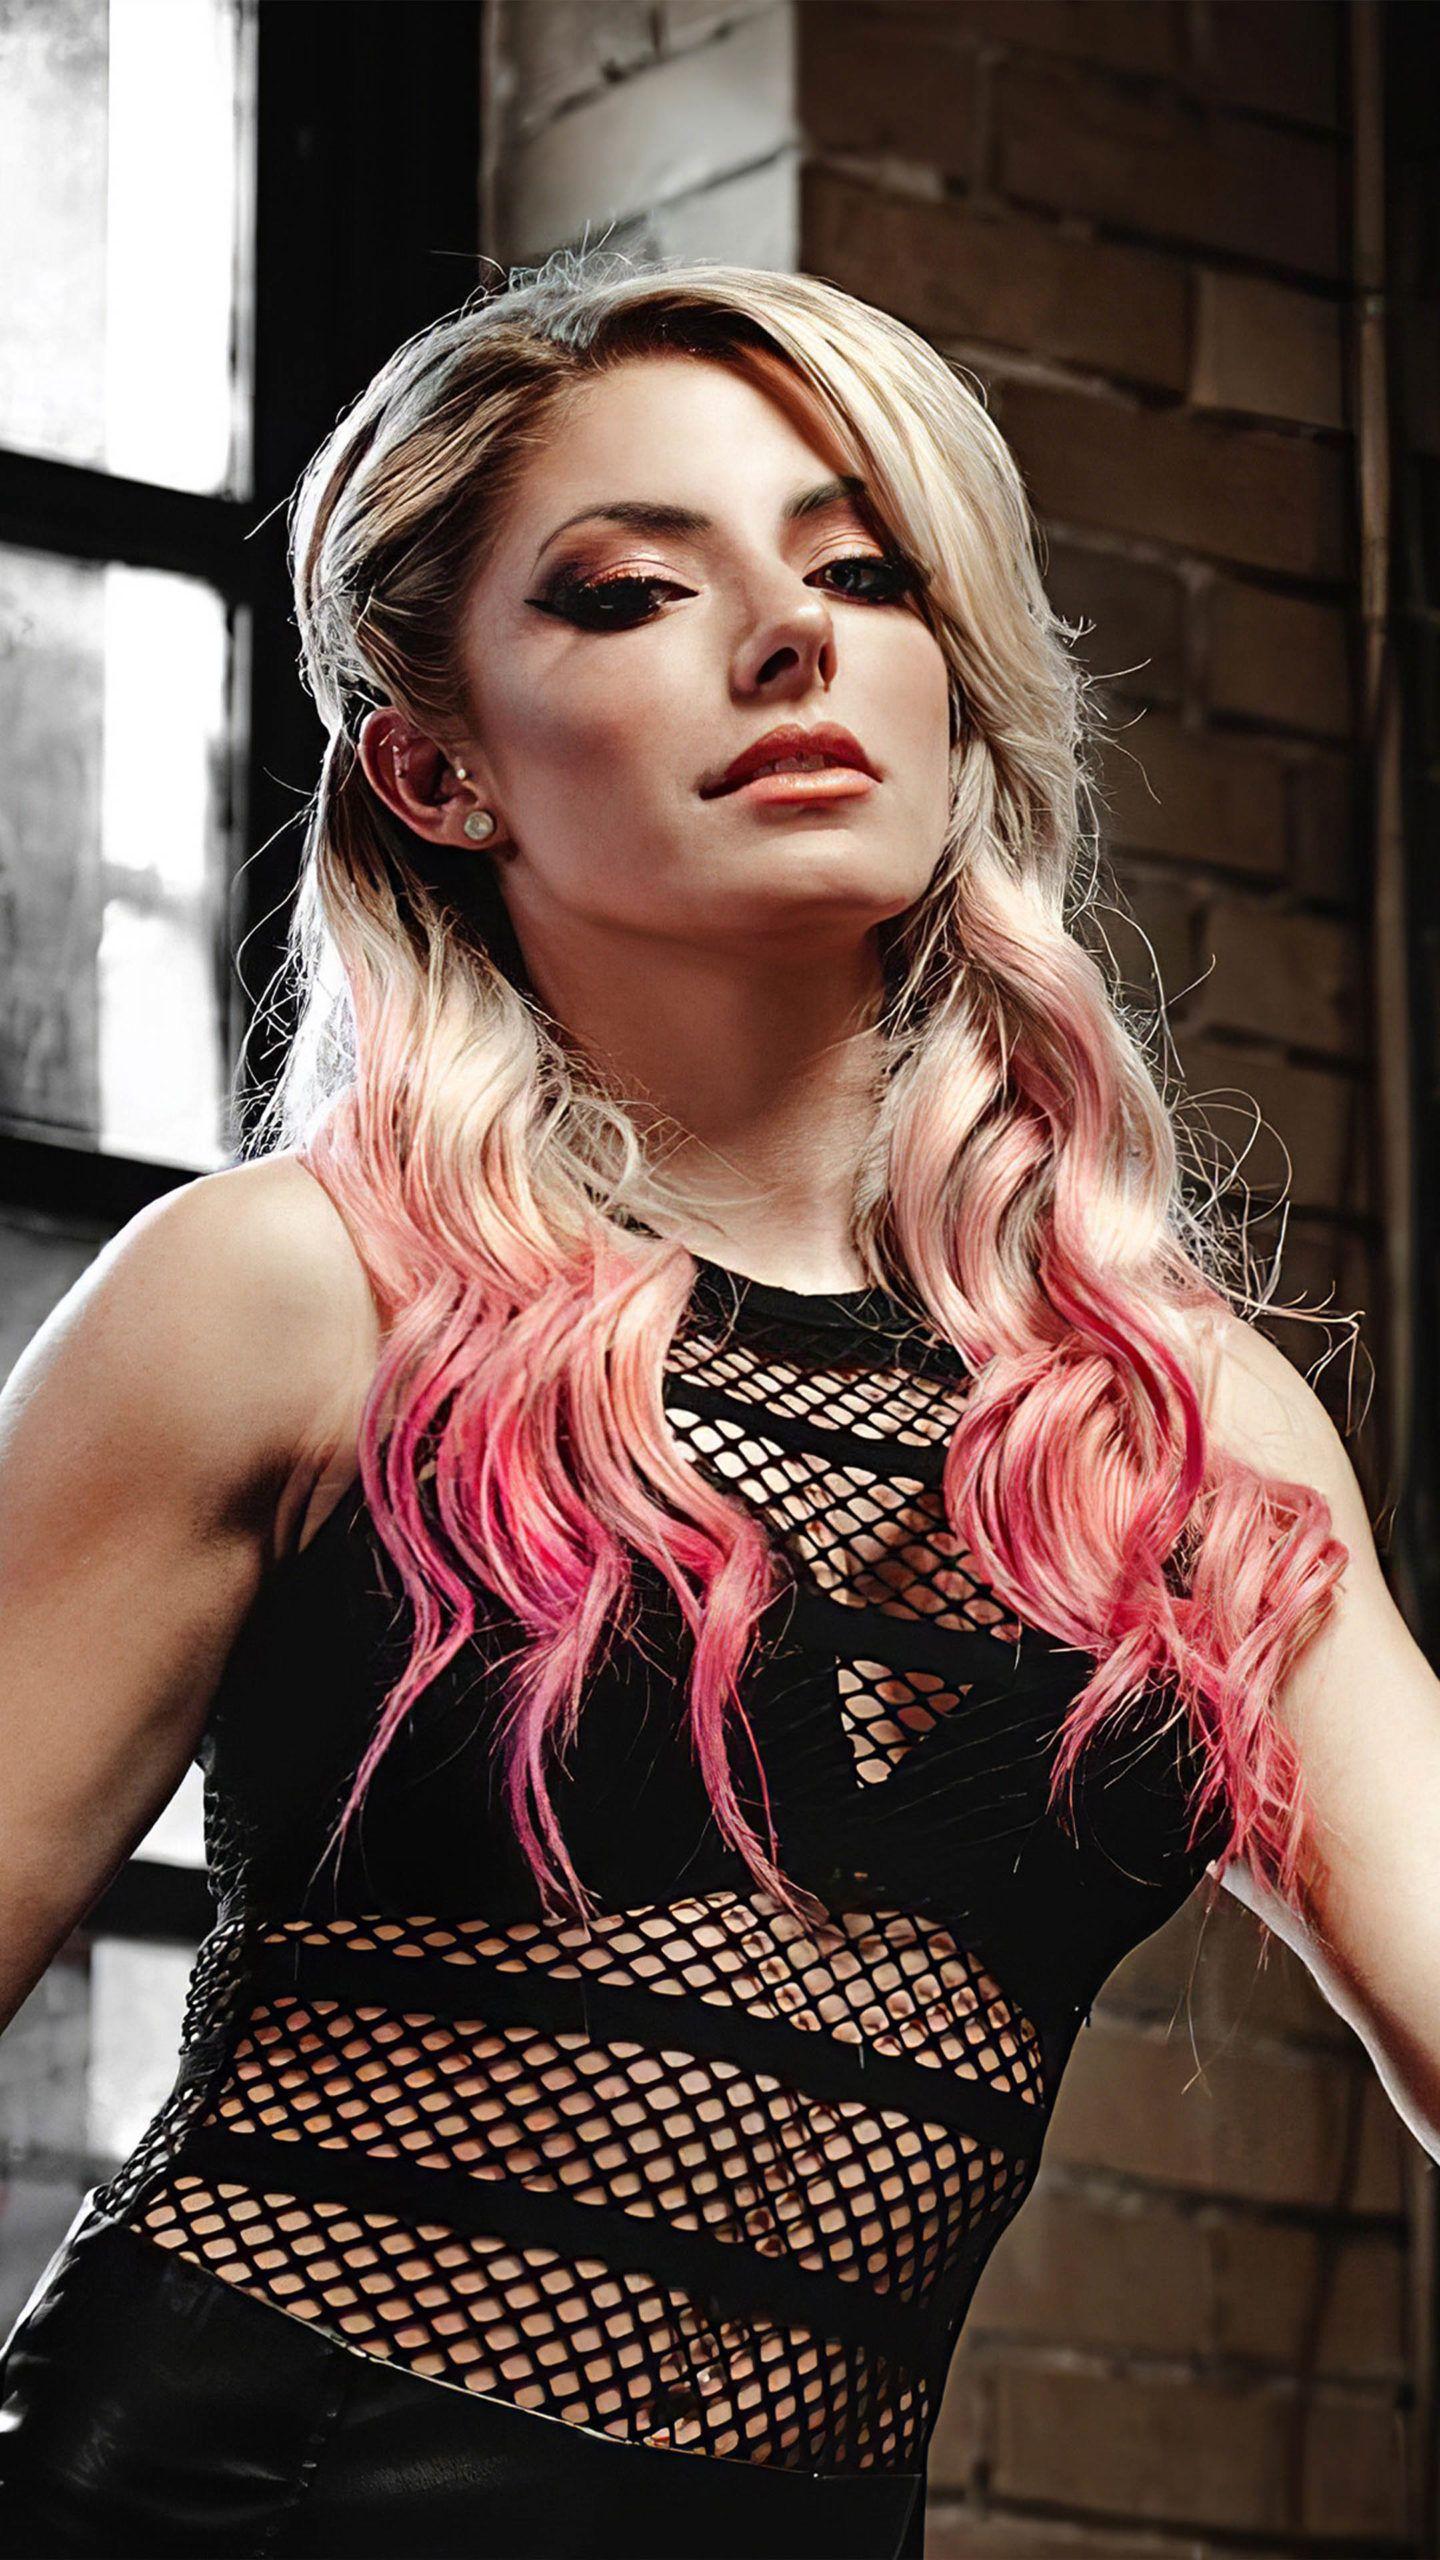 Alexa Bliss Wwe Girl 4k Ultra Hd Mobile Wallpaper Wwe Girls Wwe Raw Women Wwe